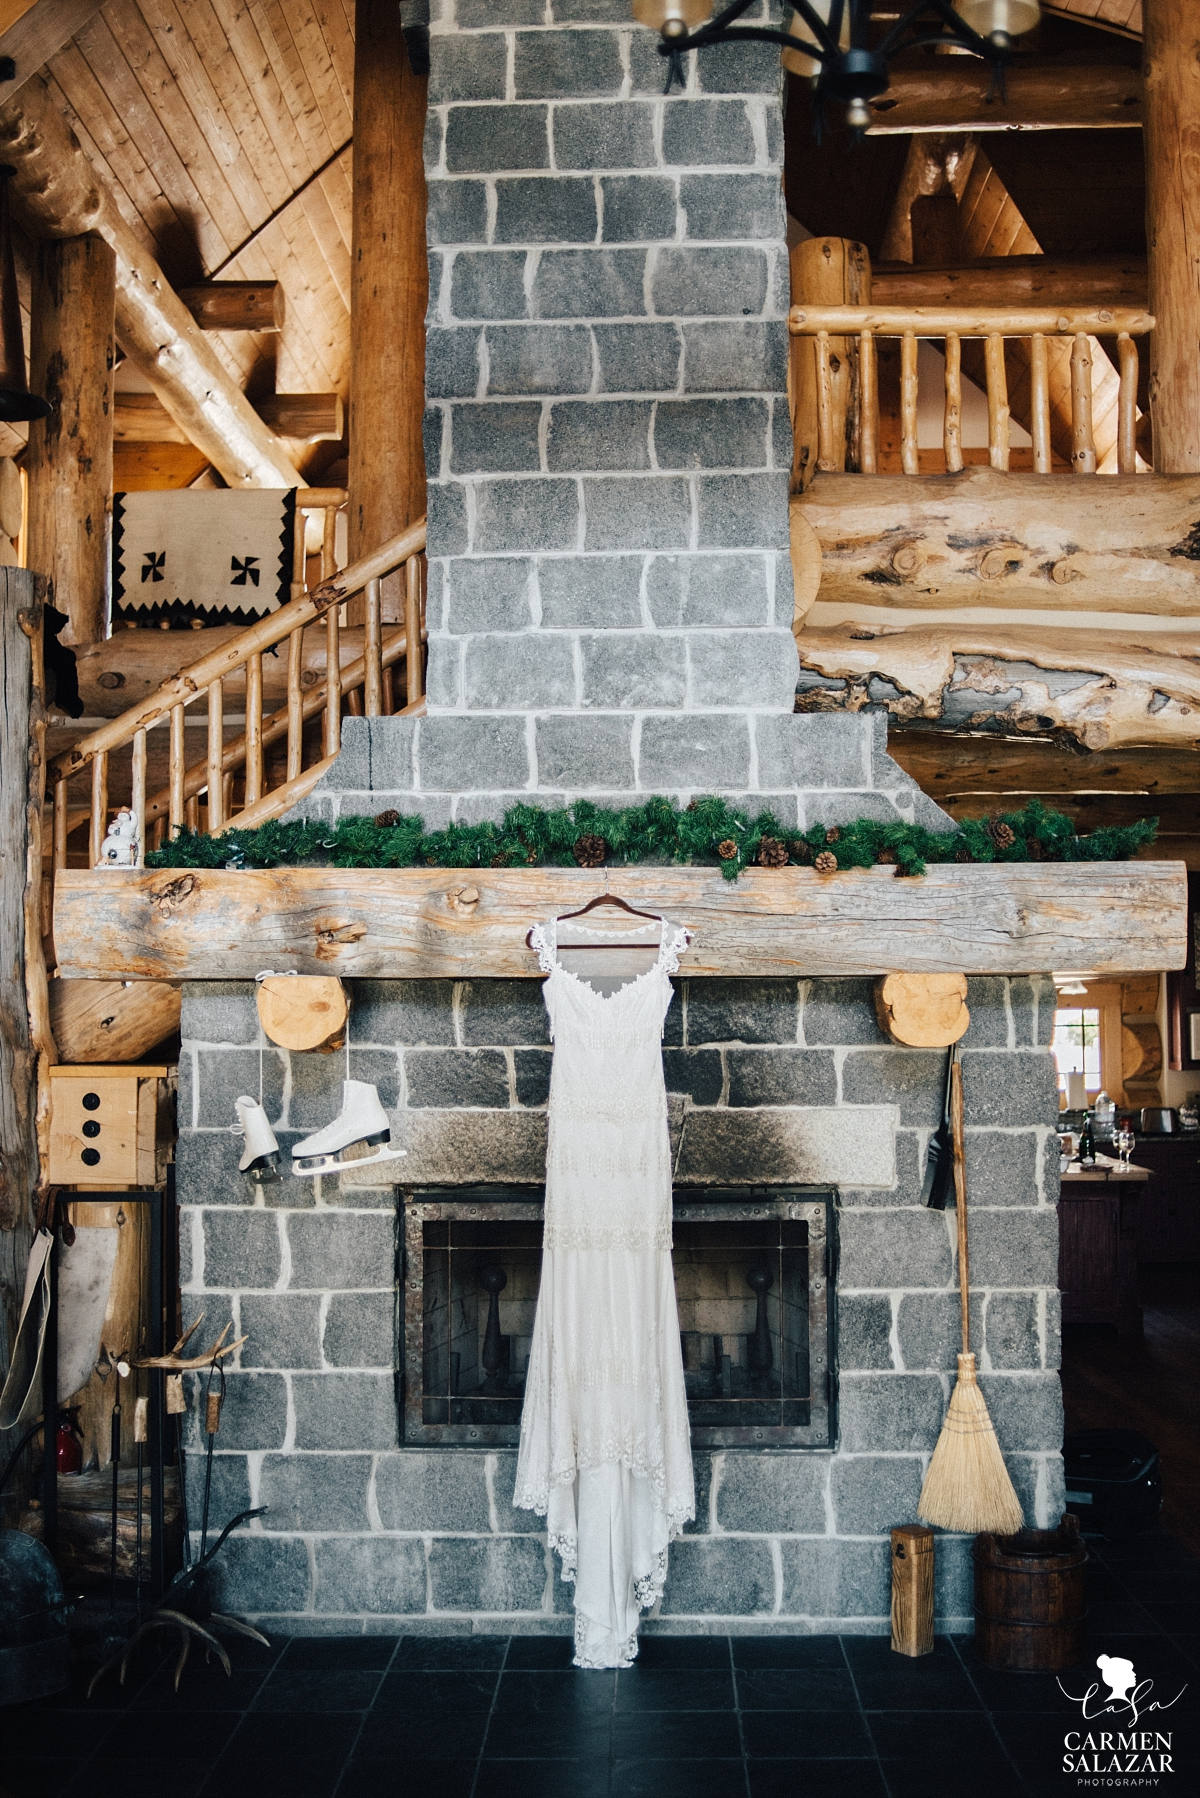 Rustic wedding cabin with vintage wedding gown - Carmen Salazar